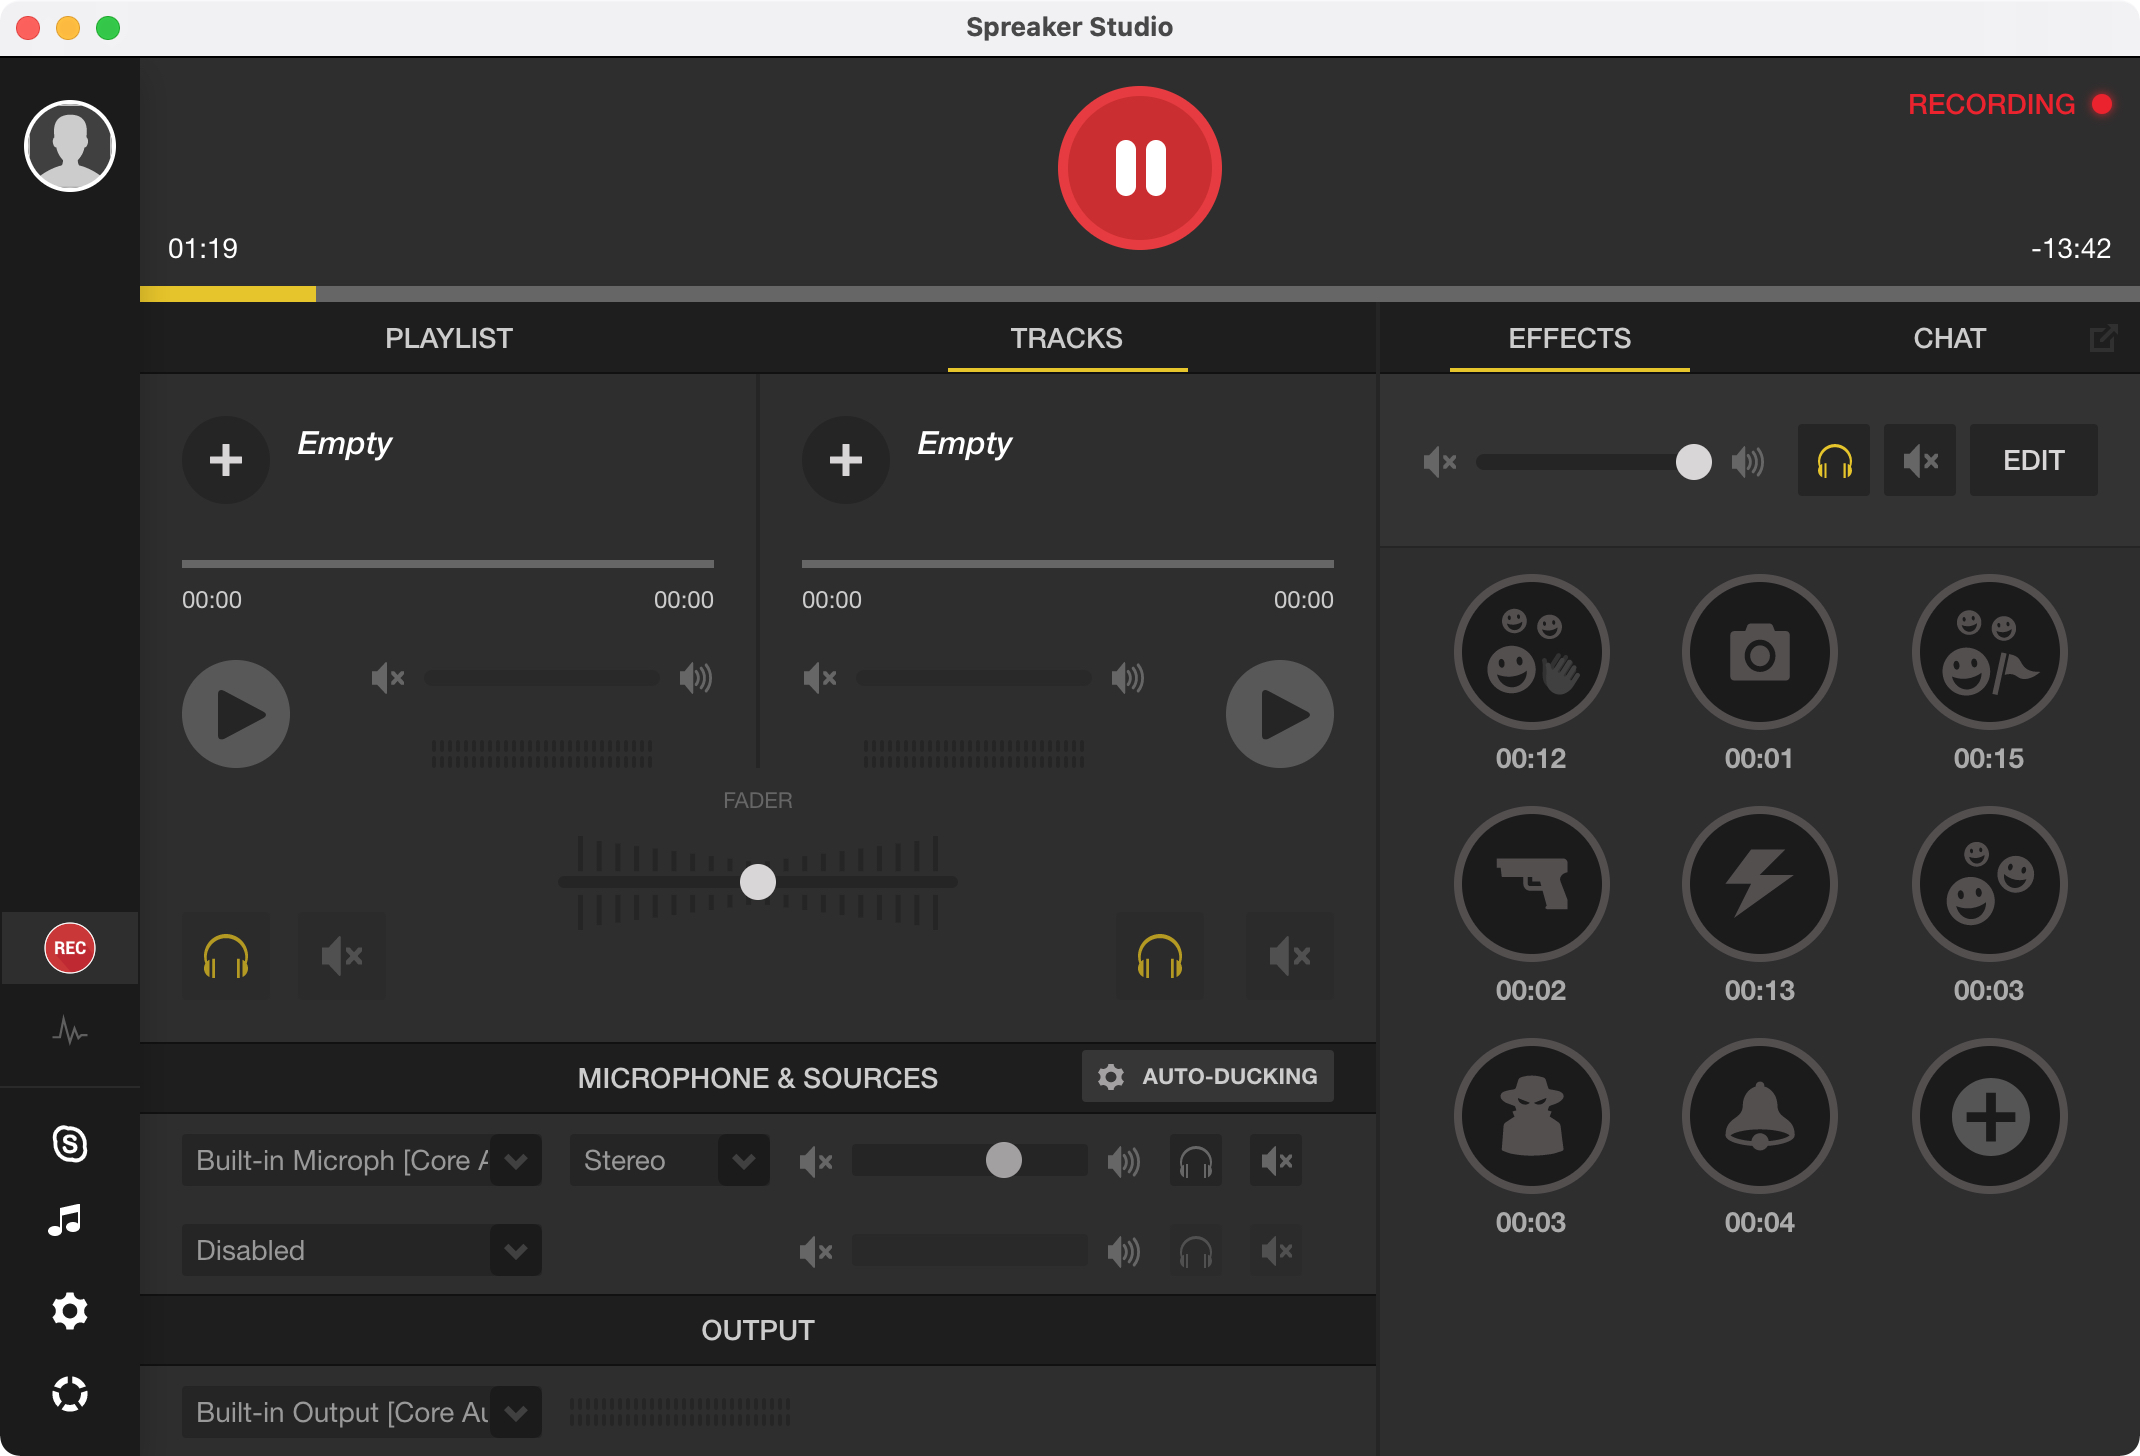 Spreaker Studio app on Mac